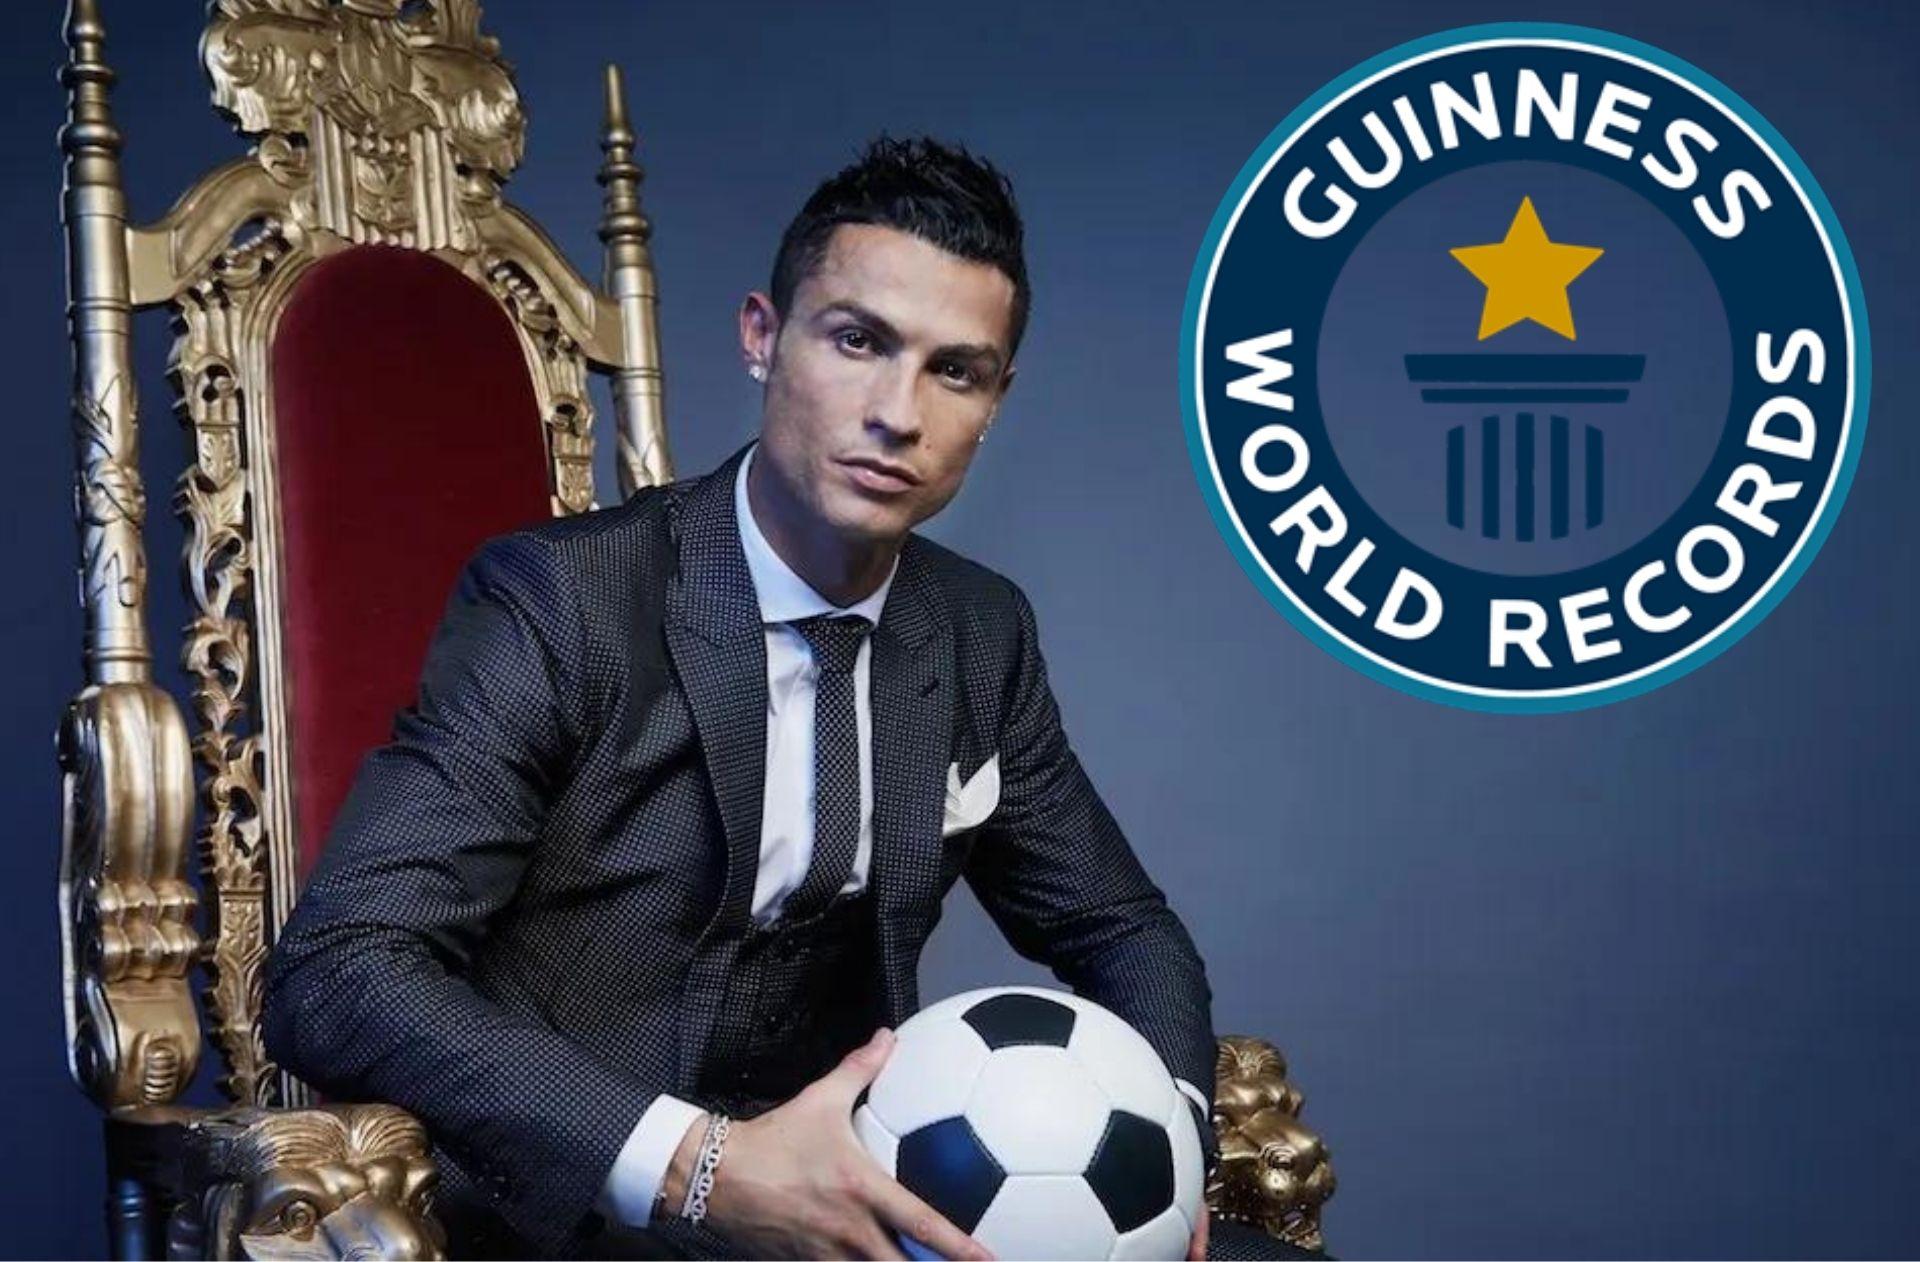 Cristiano Ronaldo, Guinness World Records